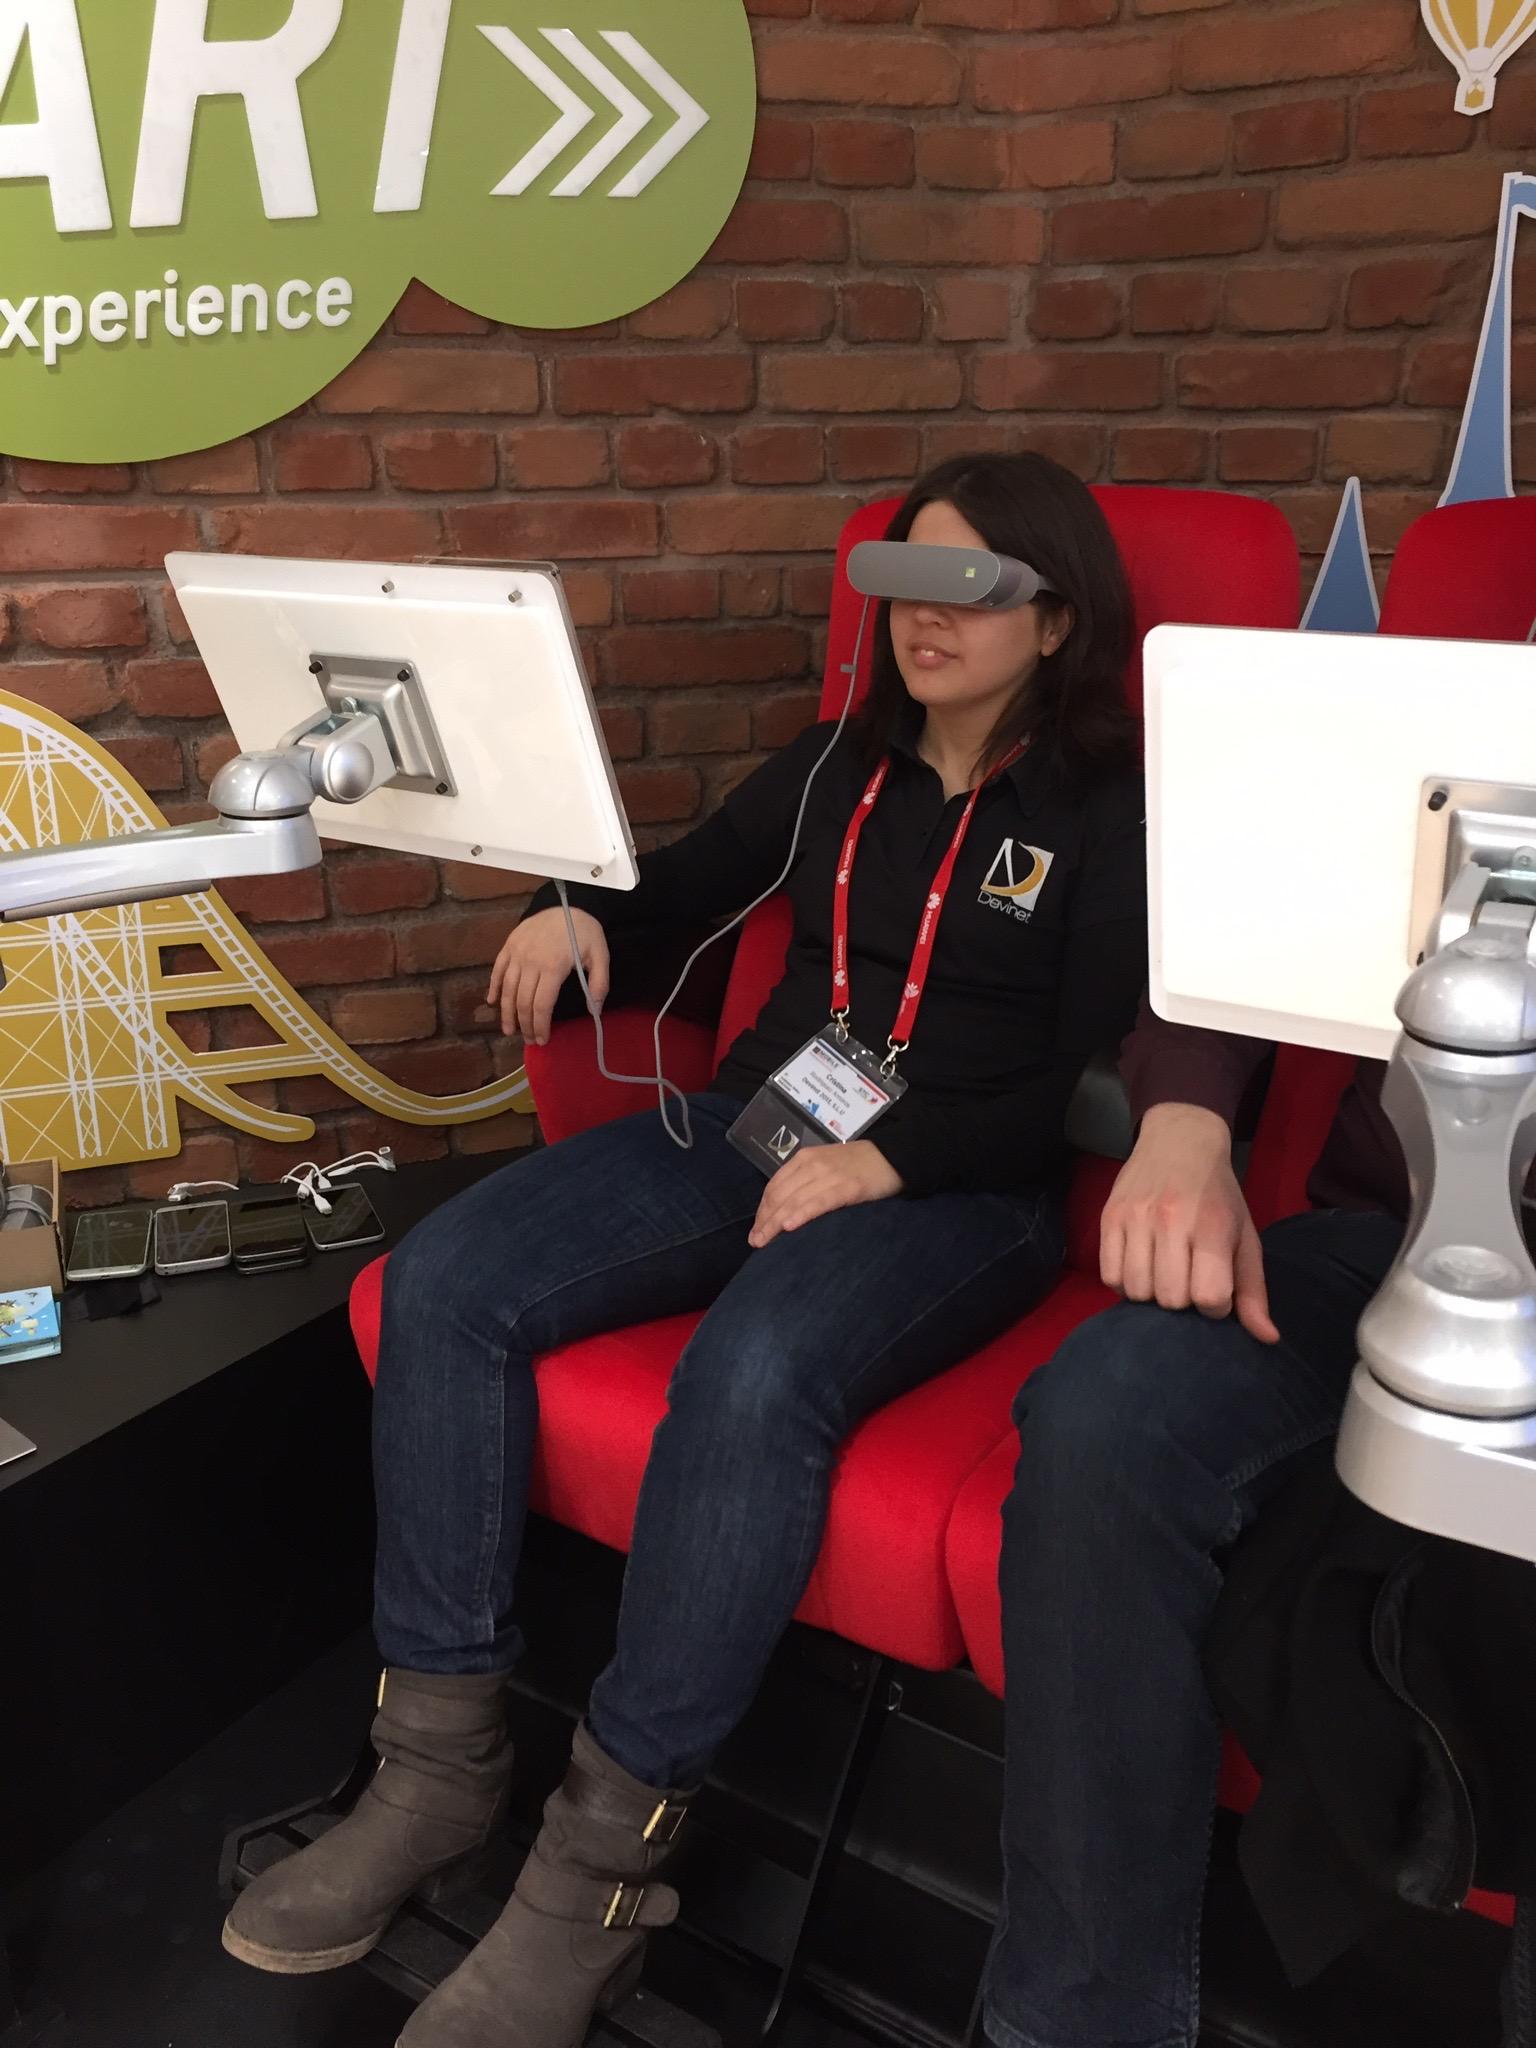 MWC - Realidad Virtual - Montaña Rusa